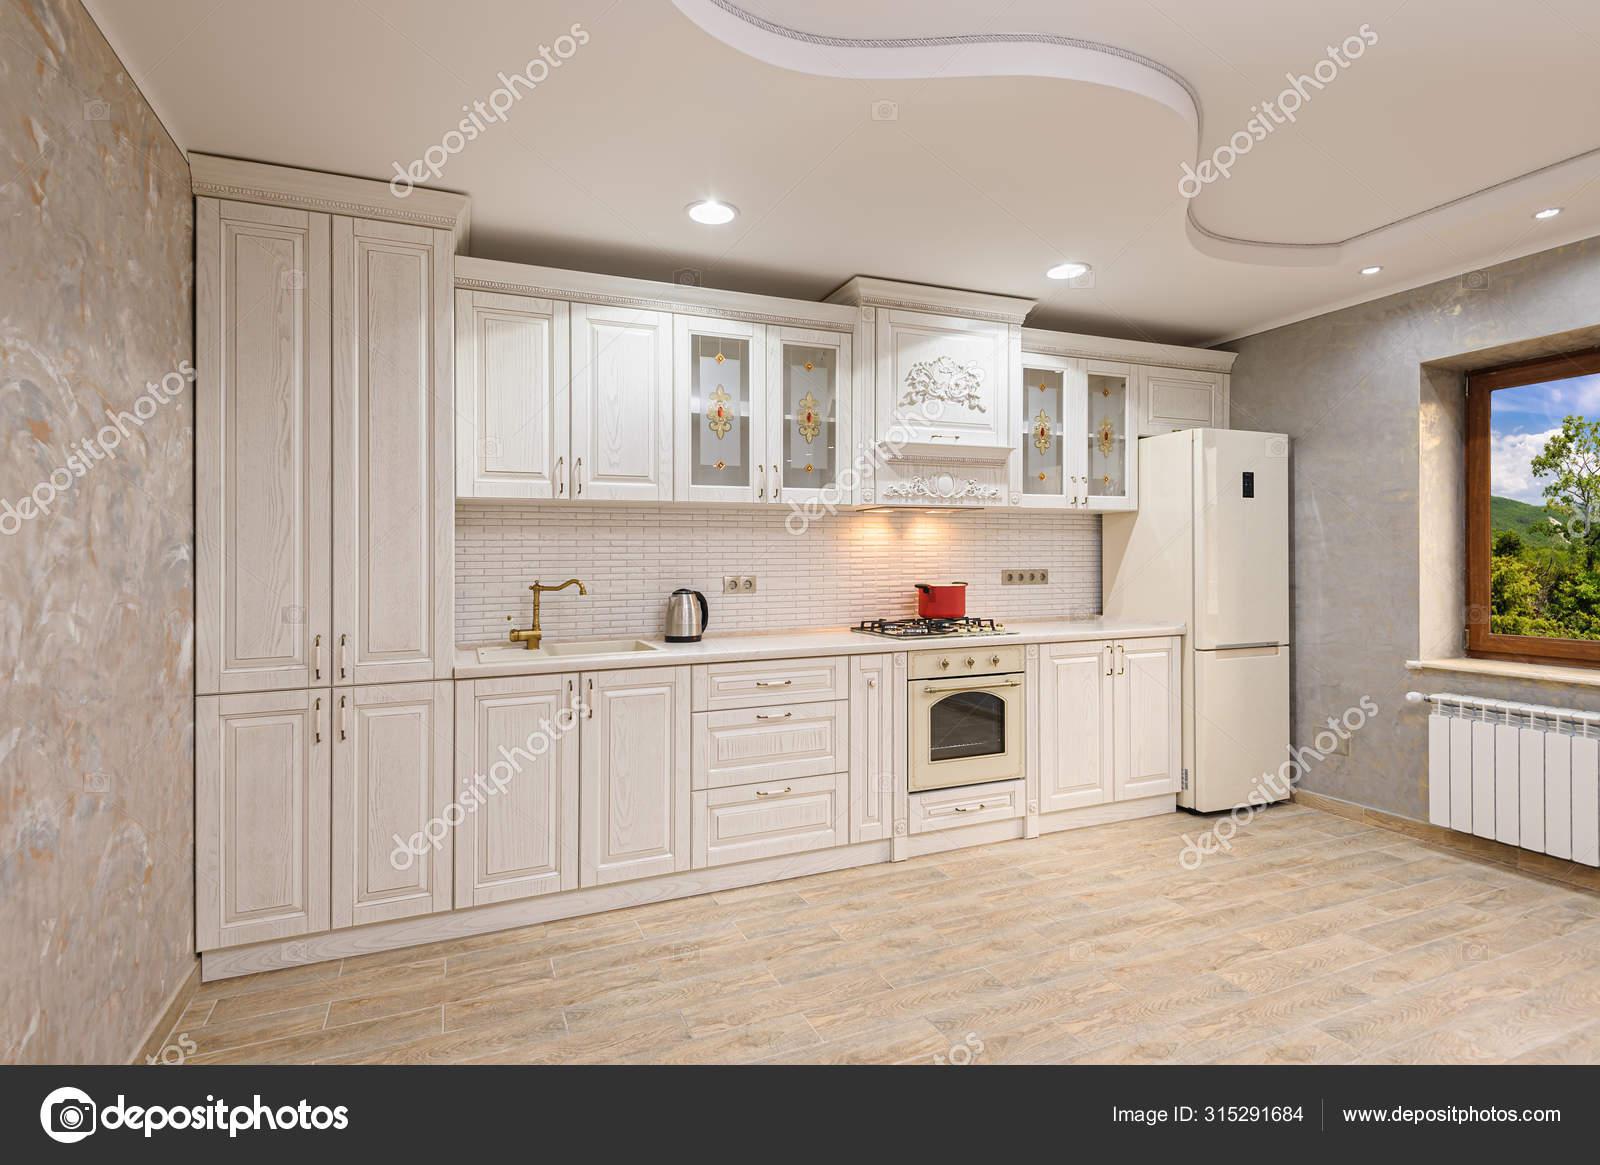 Luxury Modern White And Beige Kitchen Interior Stock Photo Image By C Starush 315291684